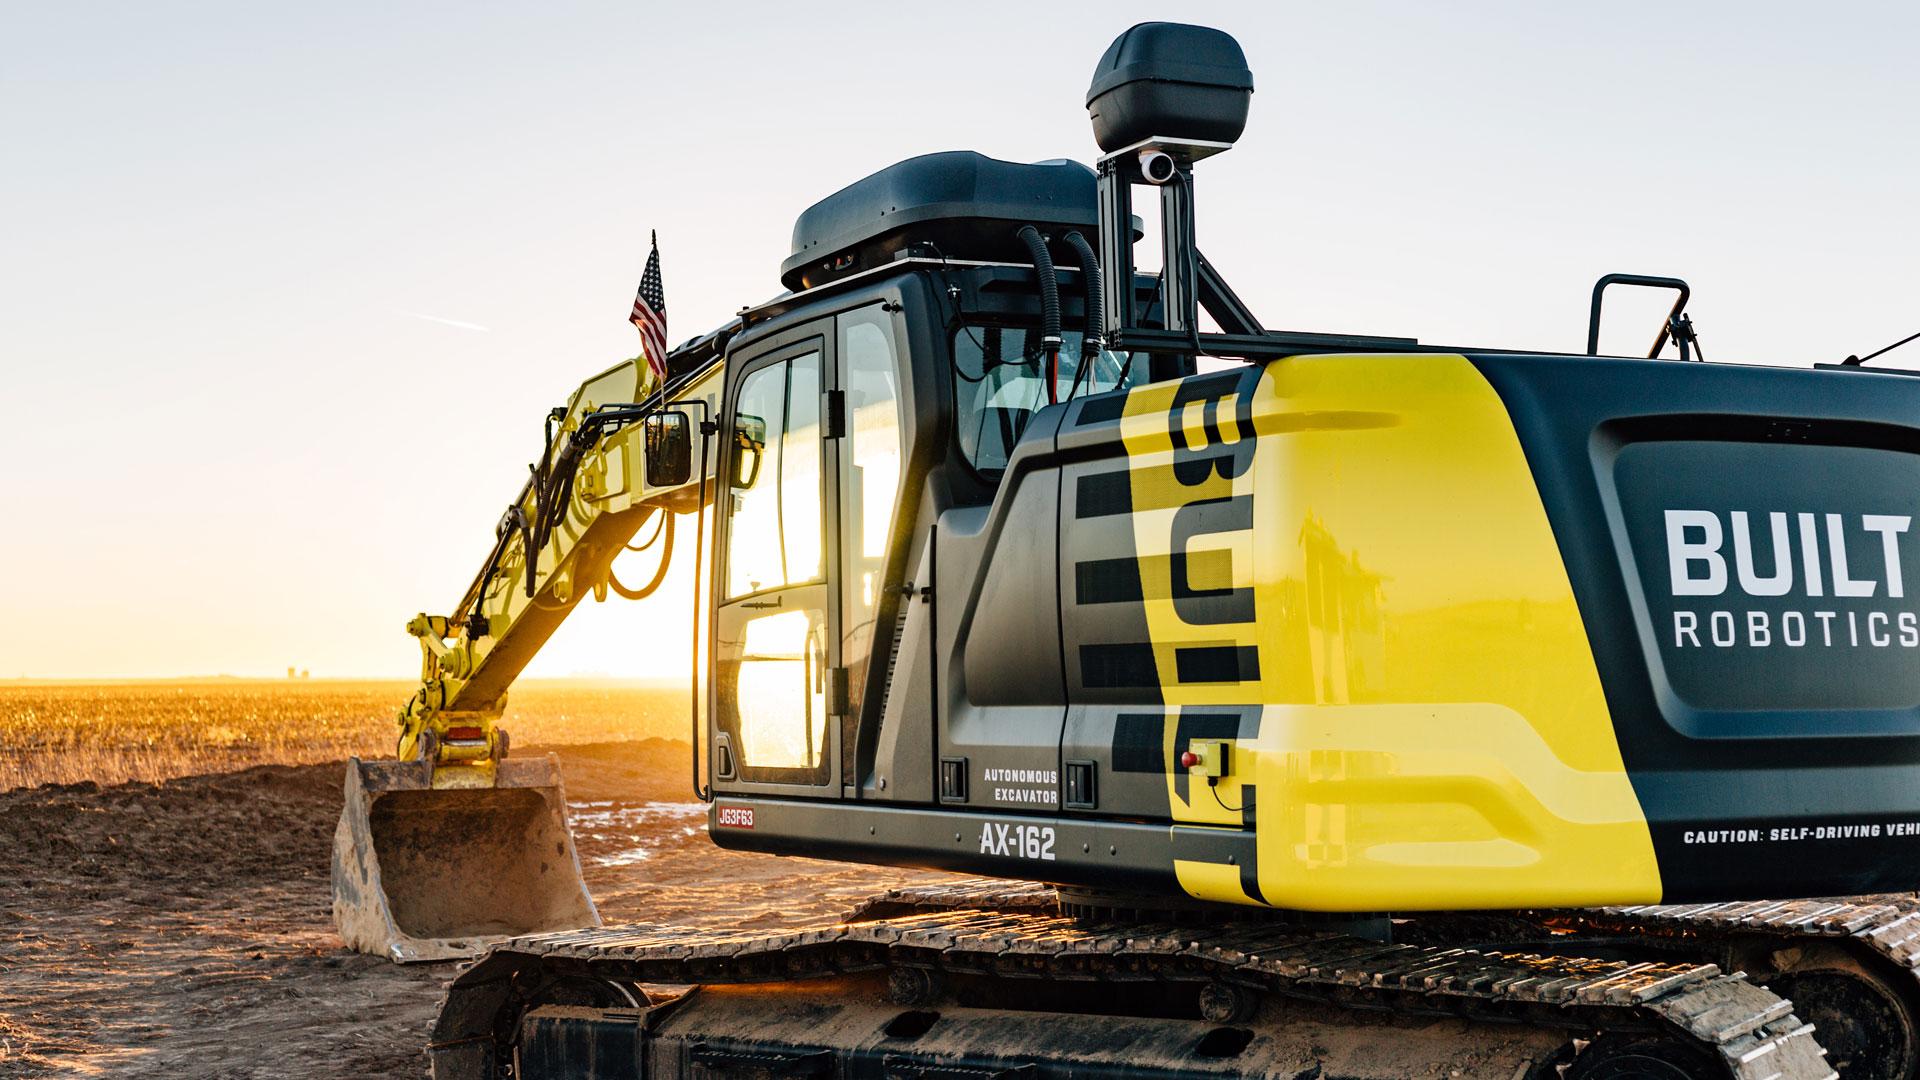 Self-Driving Excavators Hit the Market